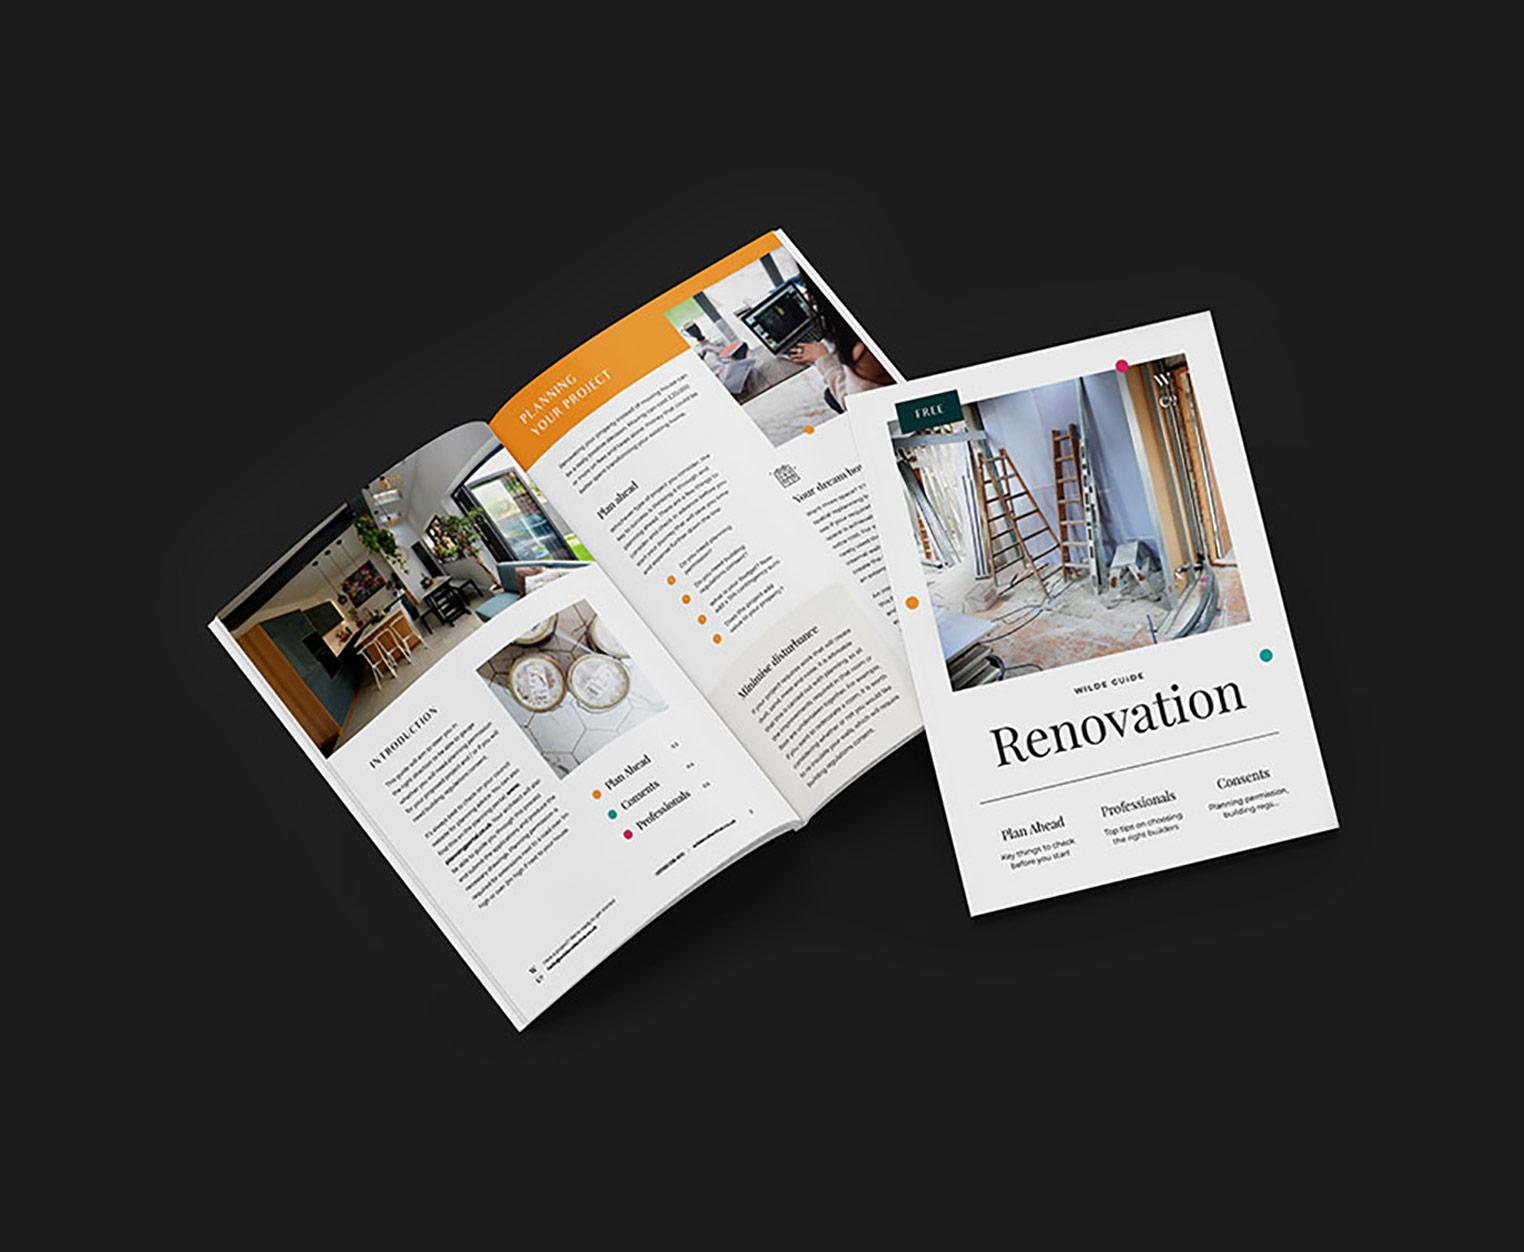 renovation guide mockup